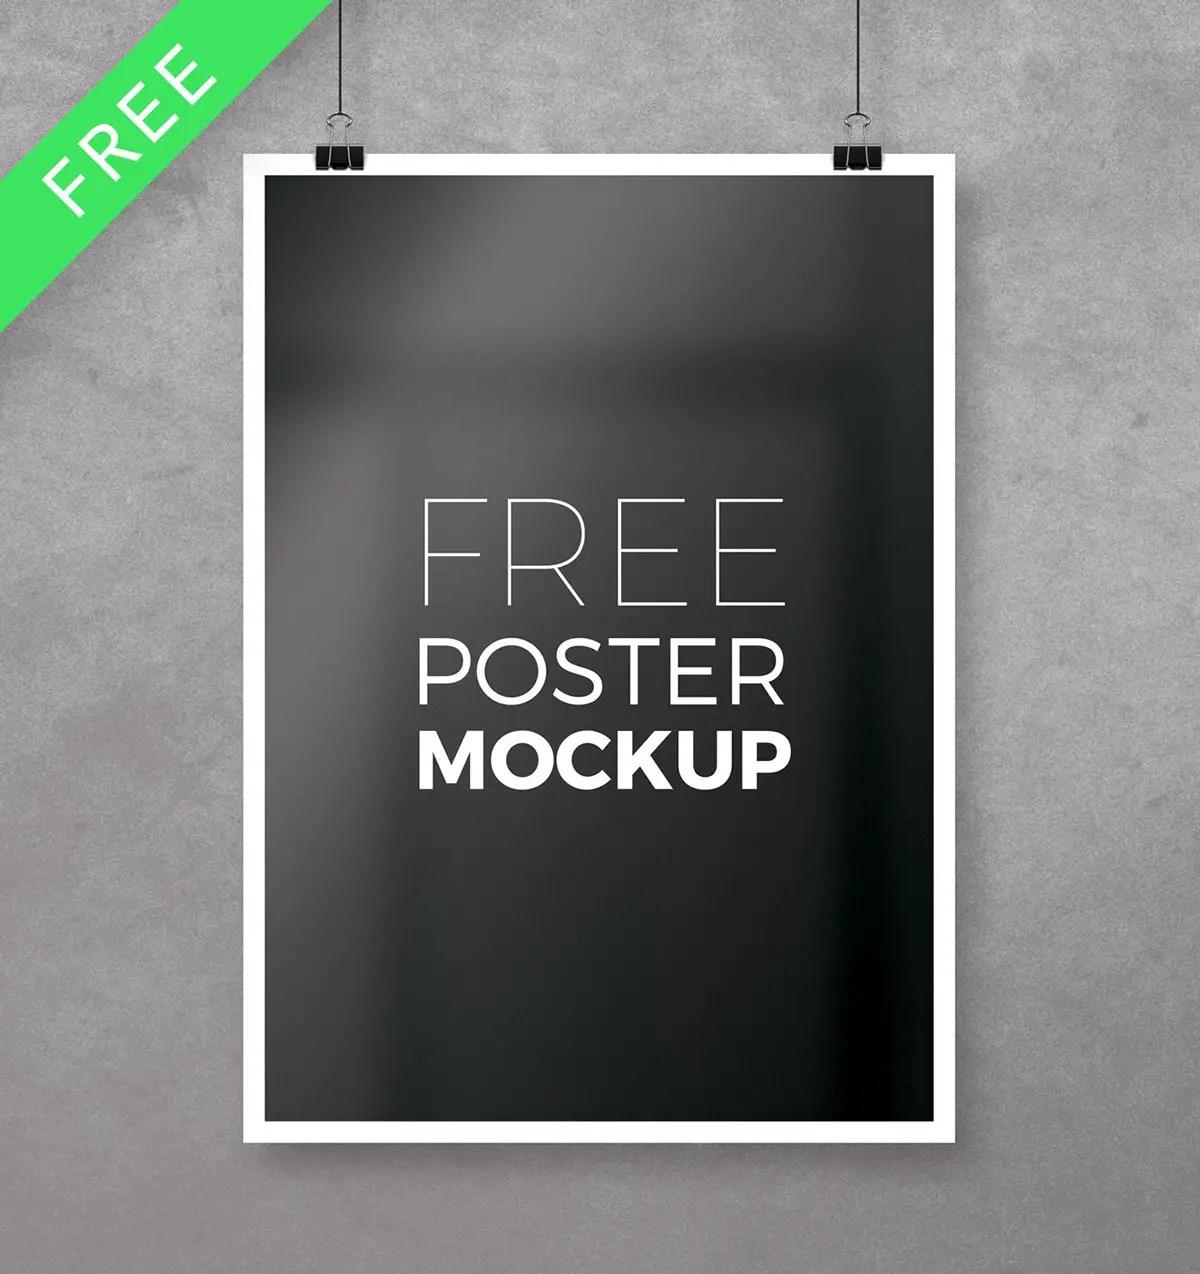 28+ Free PSD Poster Mockup Templates for Designers | PSDTemplatesBlog